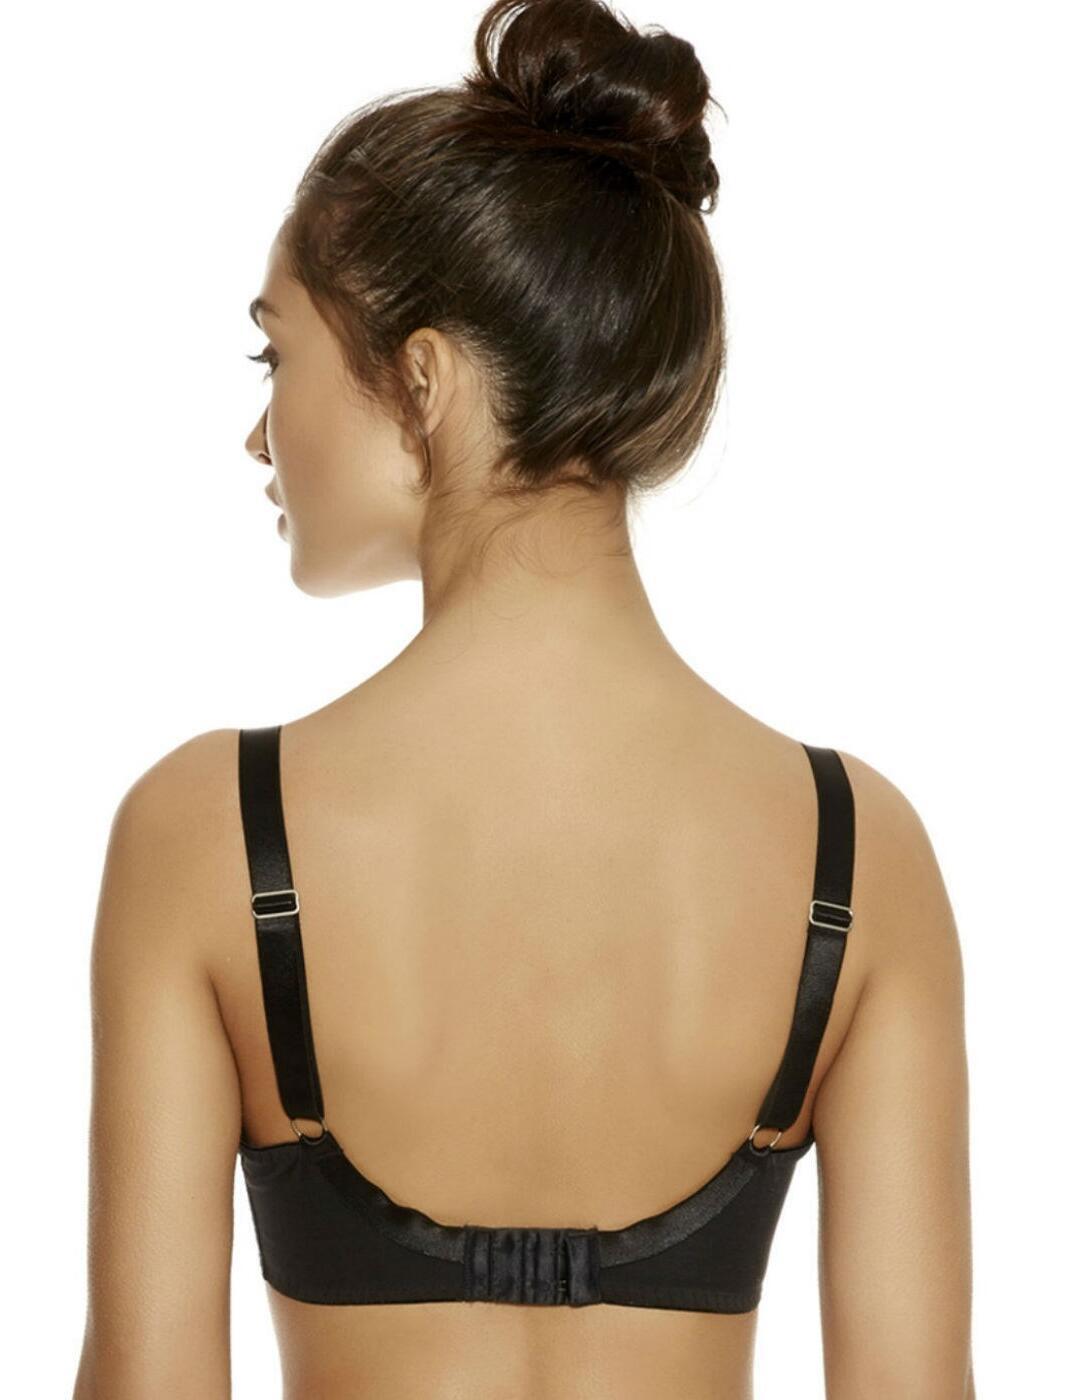 Freya-Rio-Balcony-Bra-3510-Underwired-Balconette-Support-Non-Padded-Womens-Bras miniatura 3